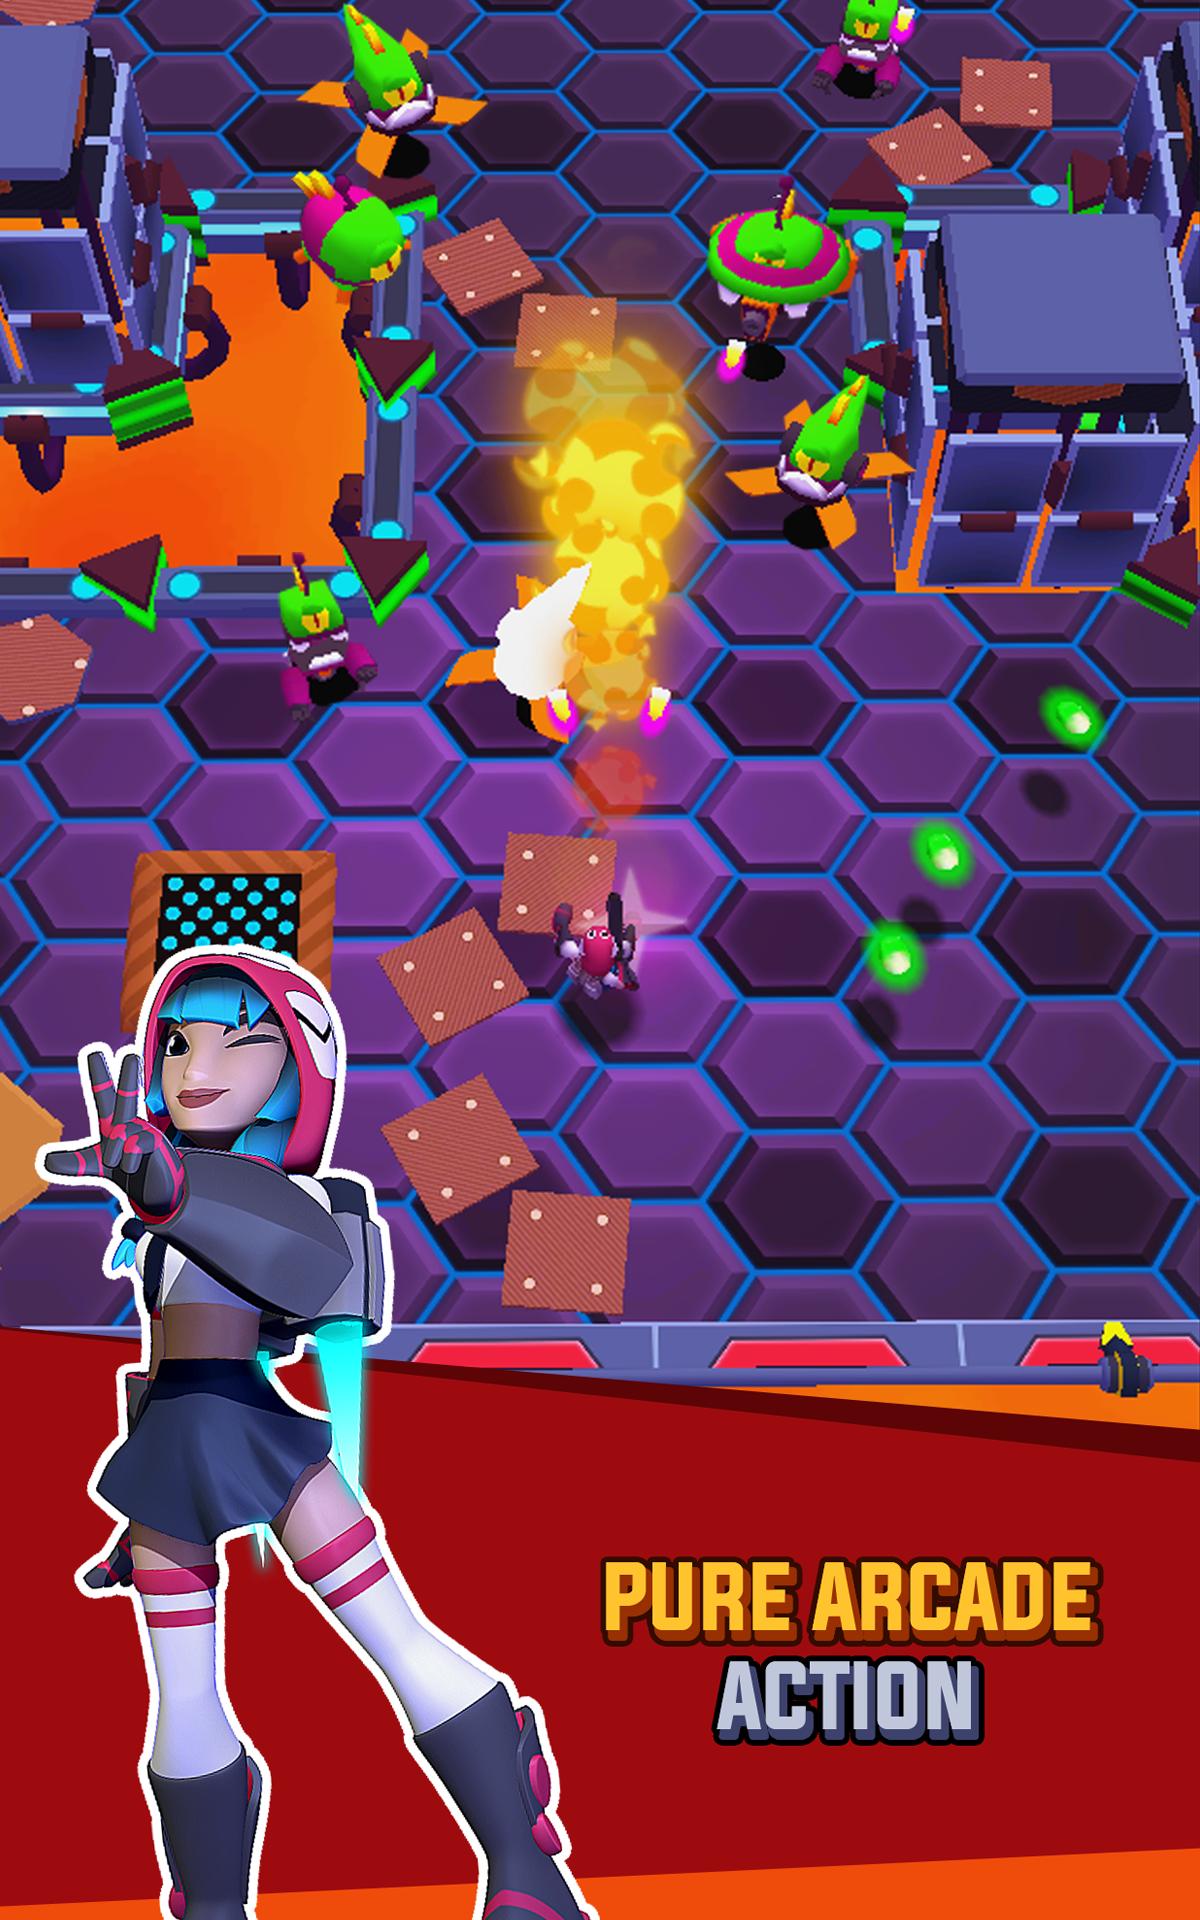 Frantic Shooter screenshot #7